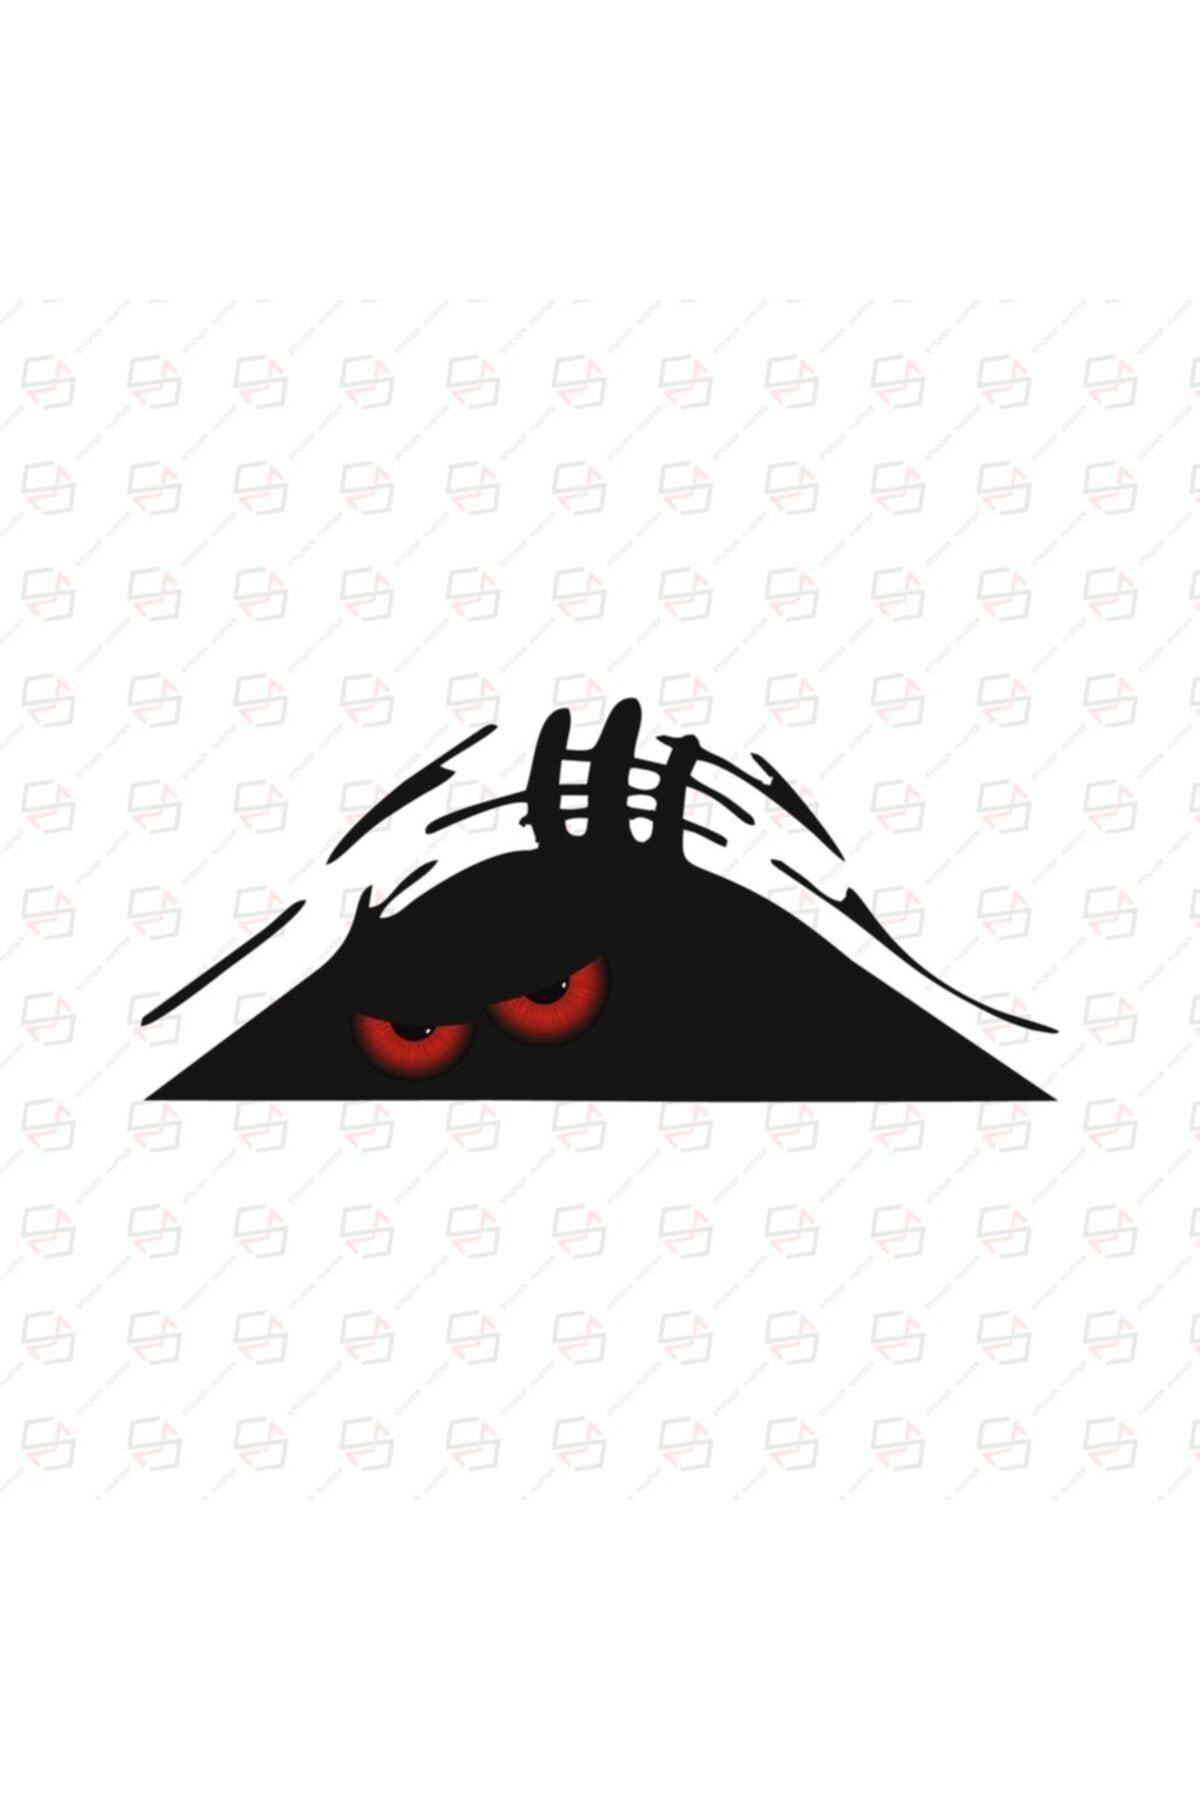 Sticker Masters Yeni Bagajdan Bakan Adam Oto Sticker 1